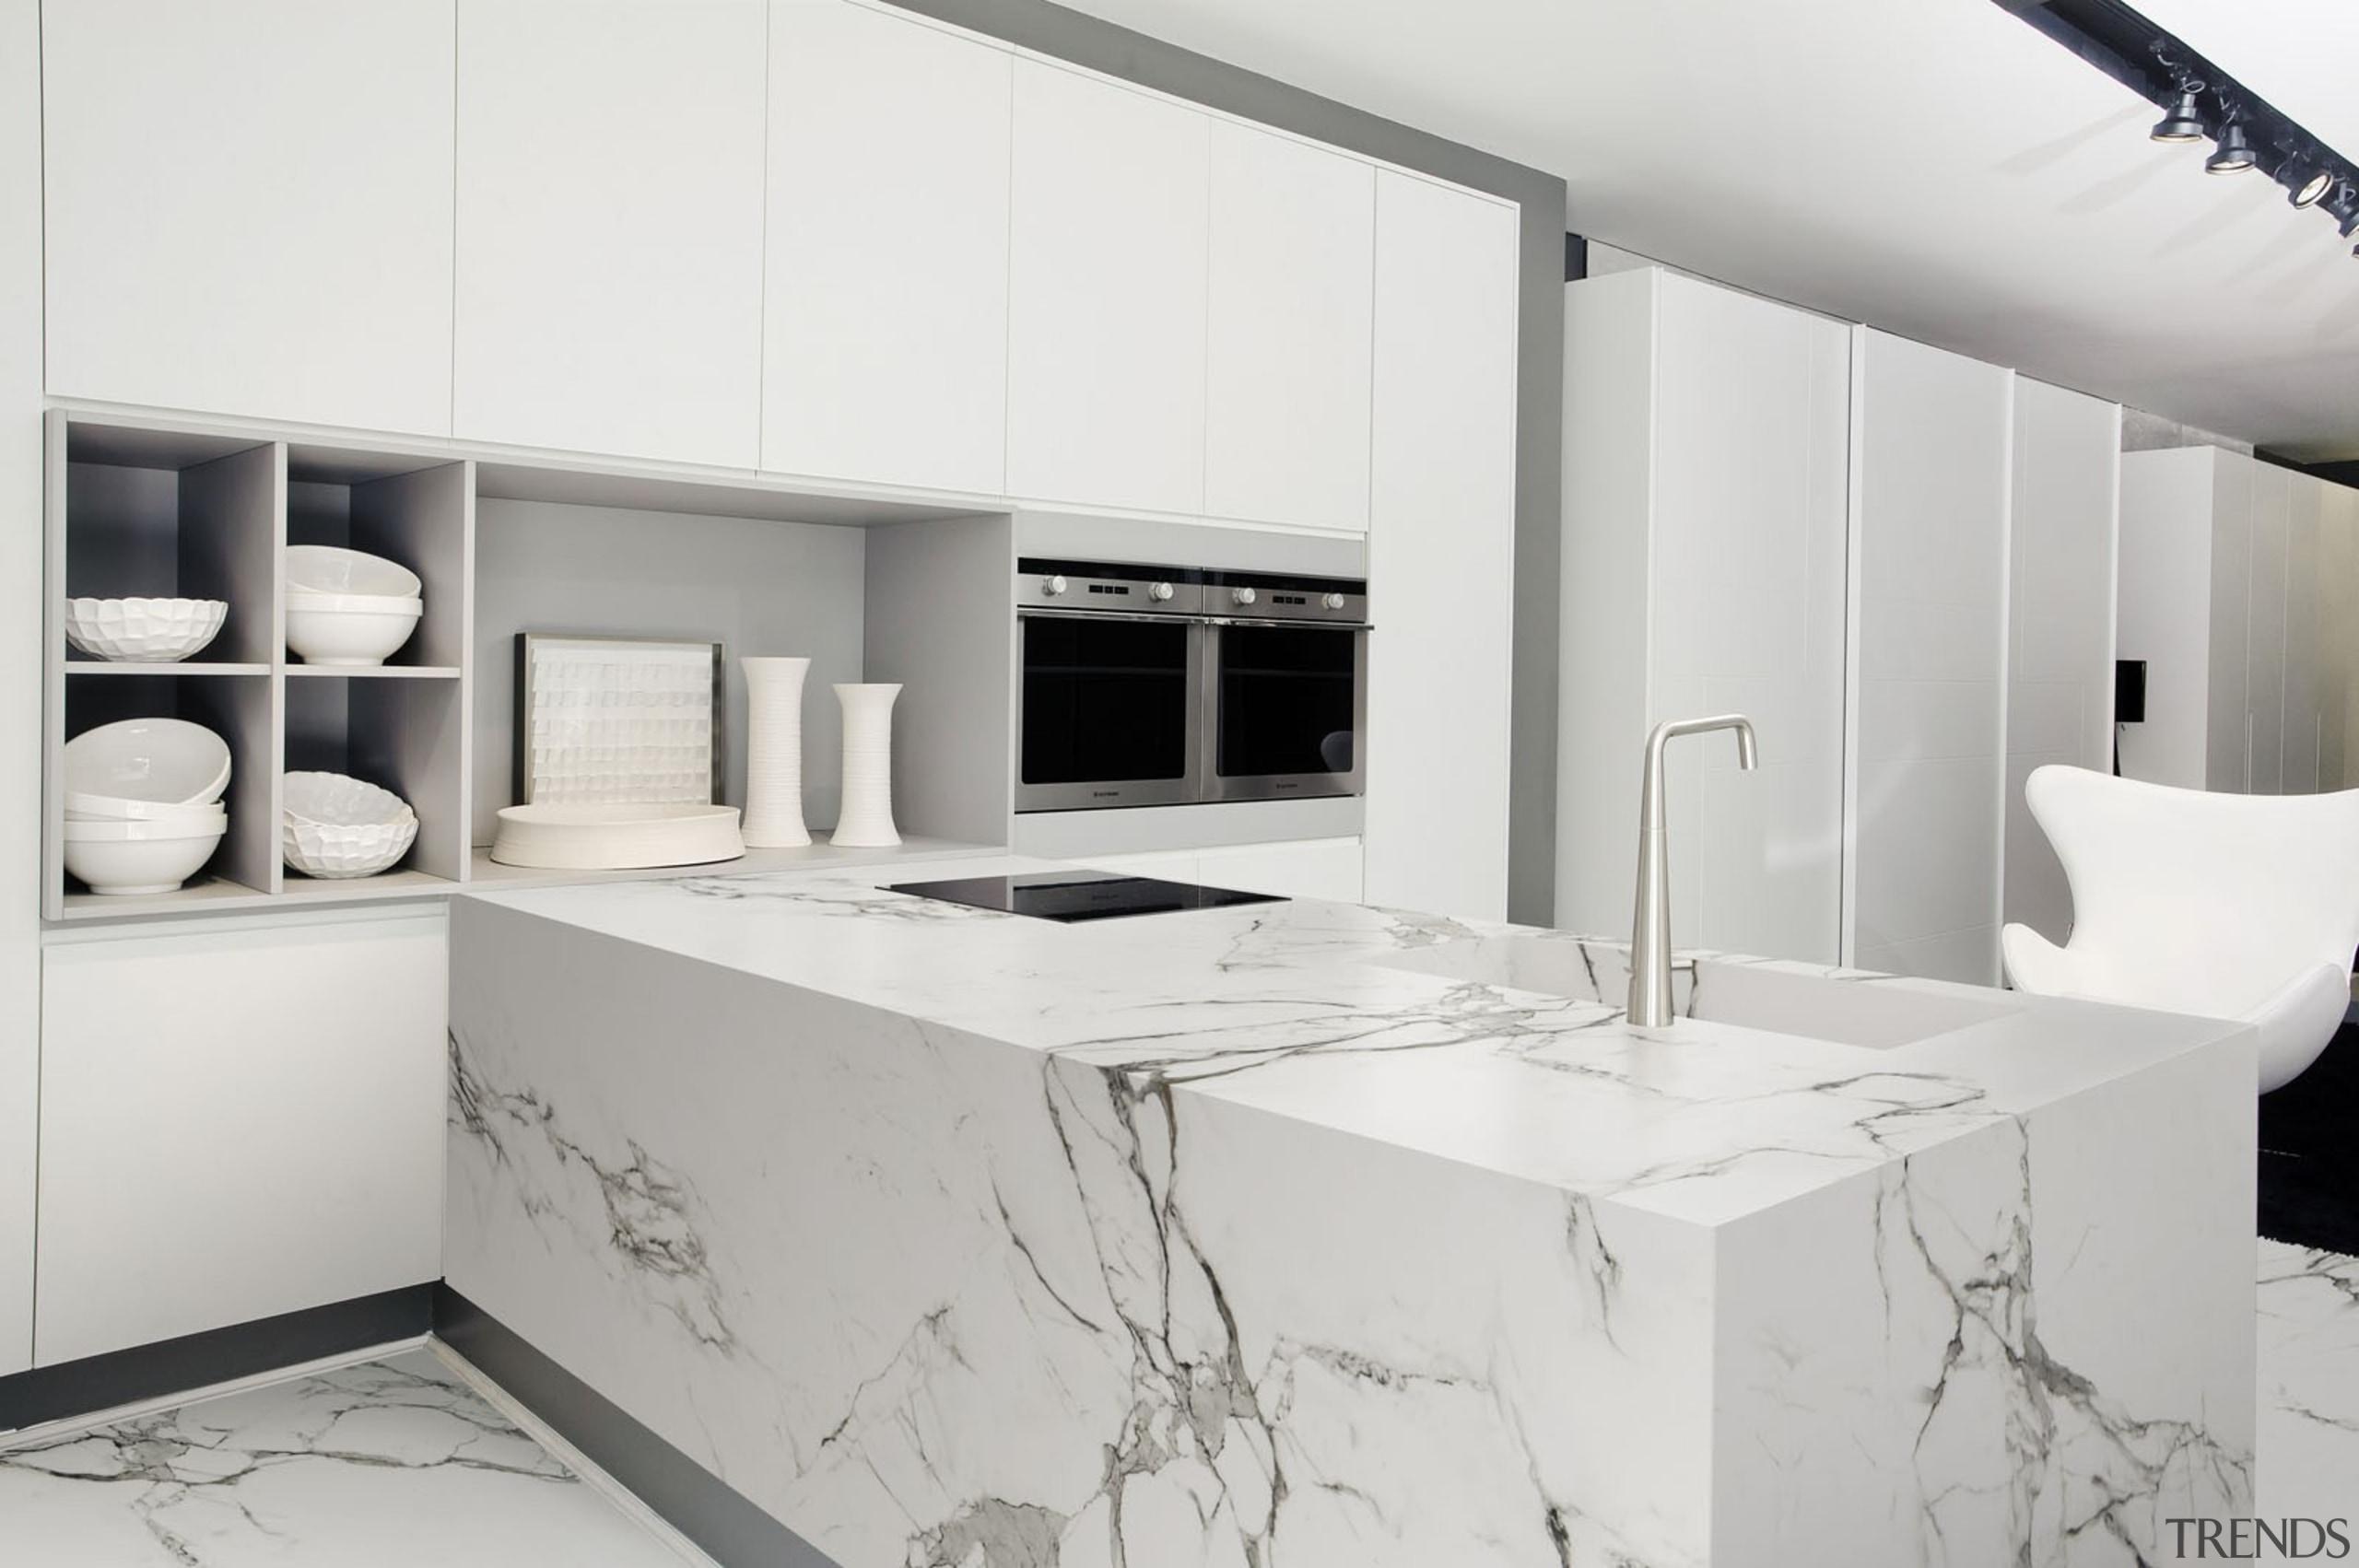 AURA Cocina - AURA Cocina - countertop   countertop, interior design, kitchen, product design, white